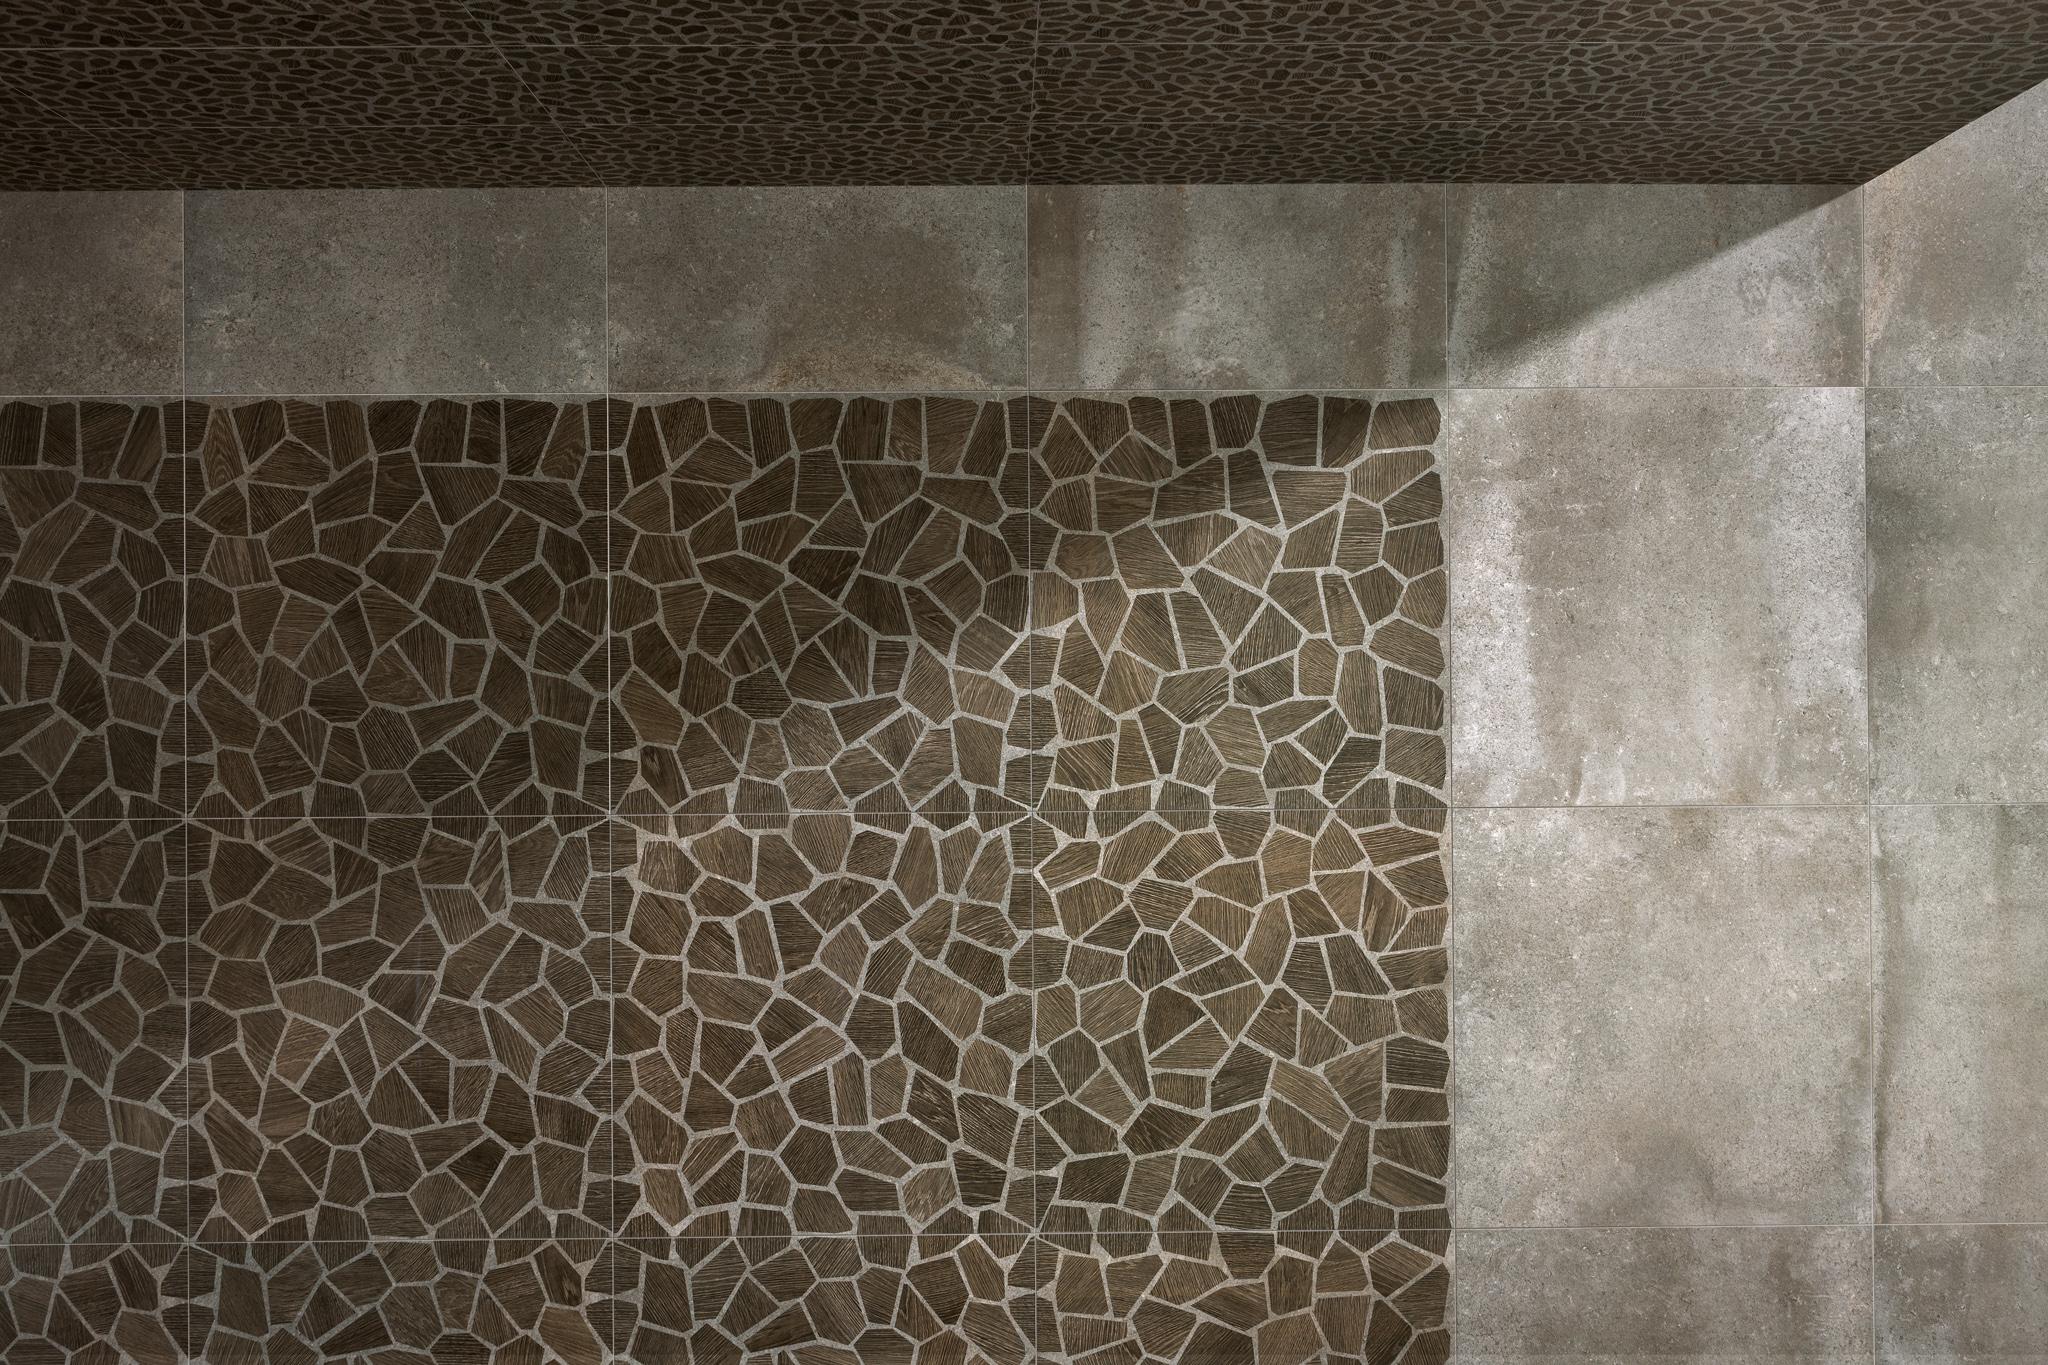 porcelain tile images: Completo range high quality photo